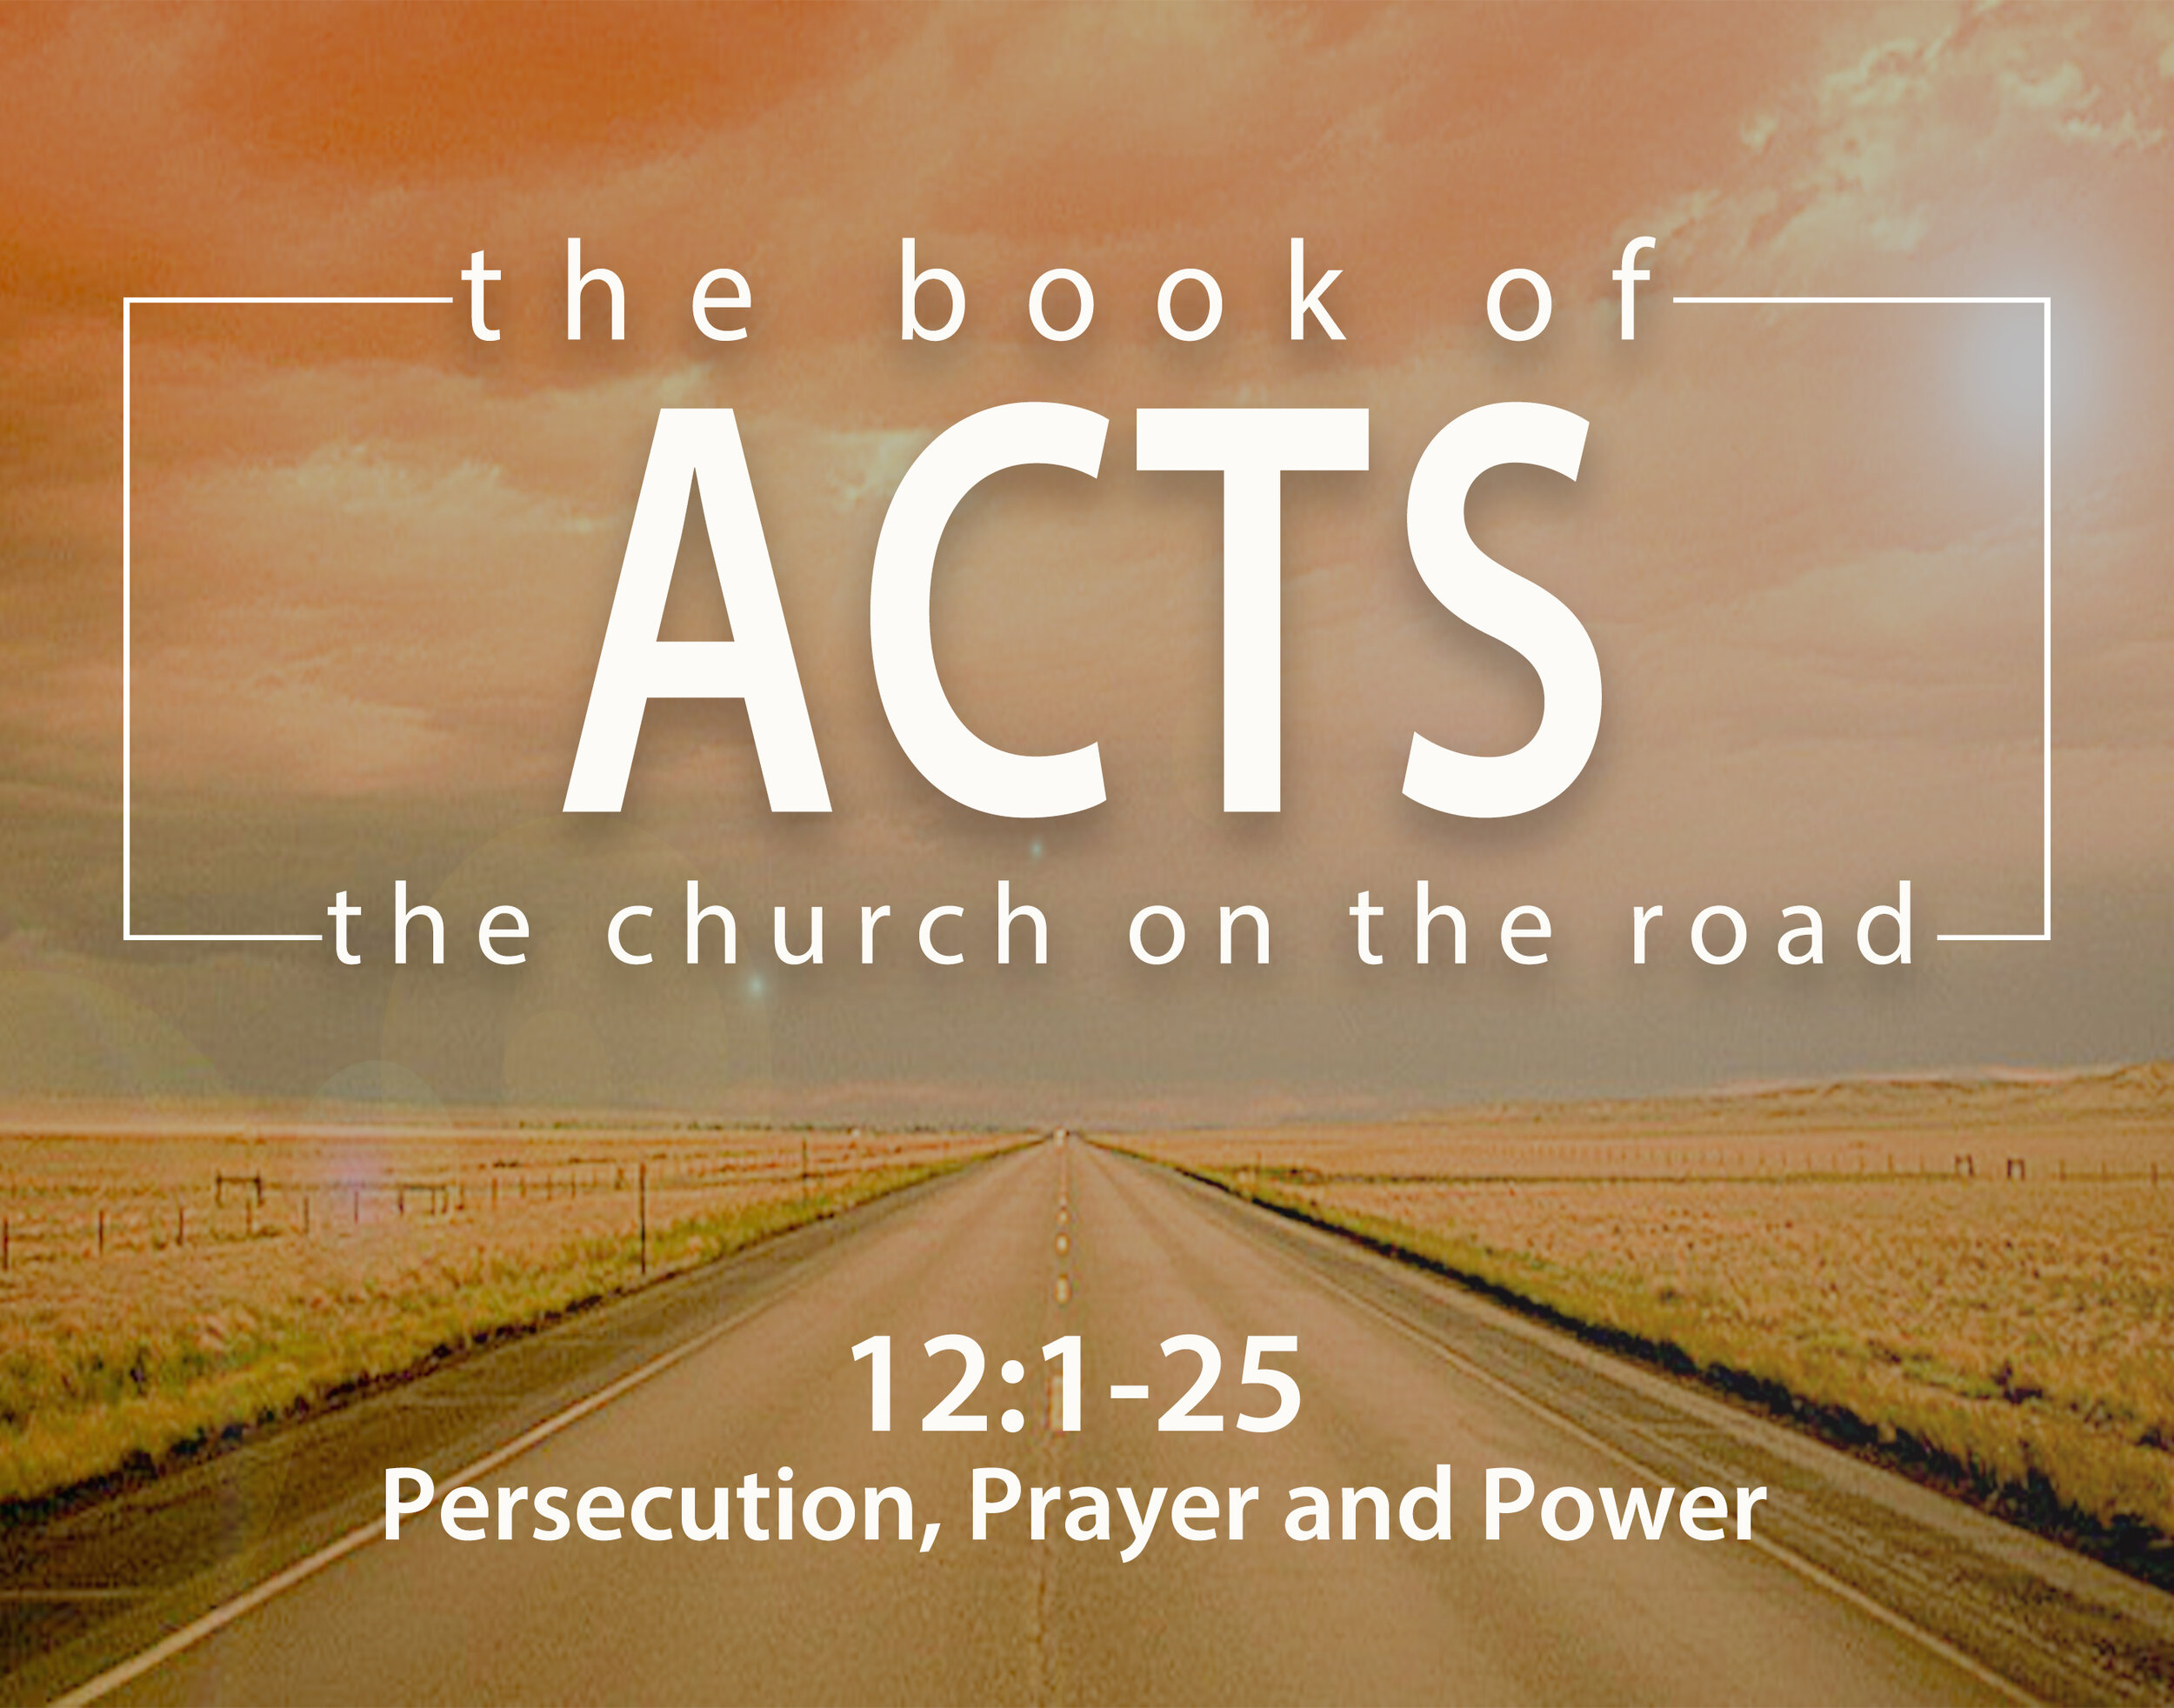 20Persecution, Prayer and Power.jpg